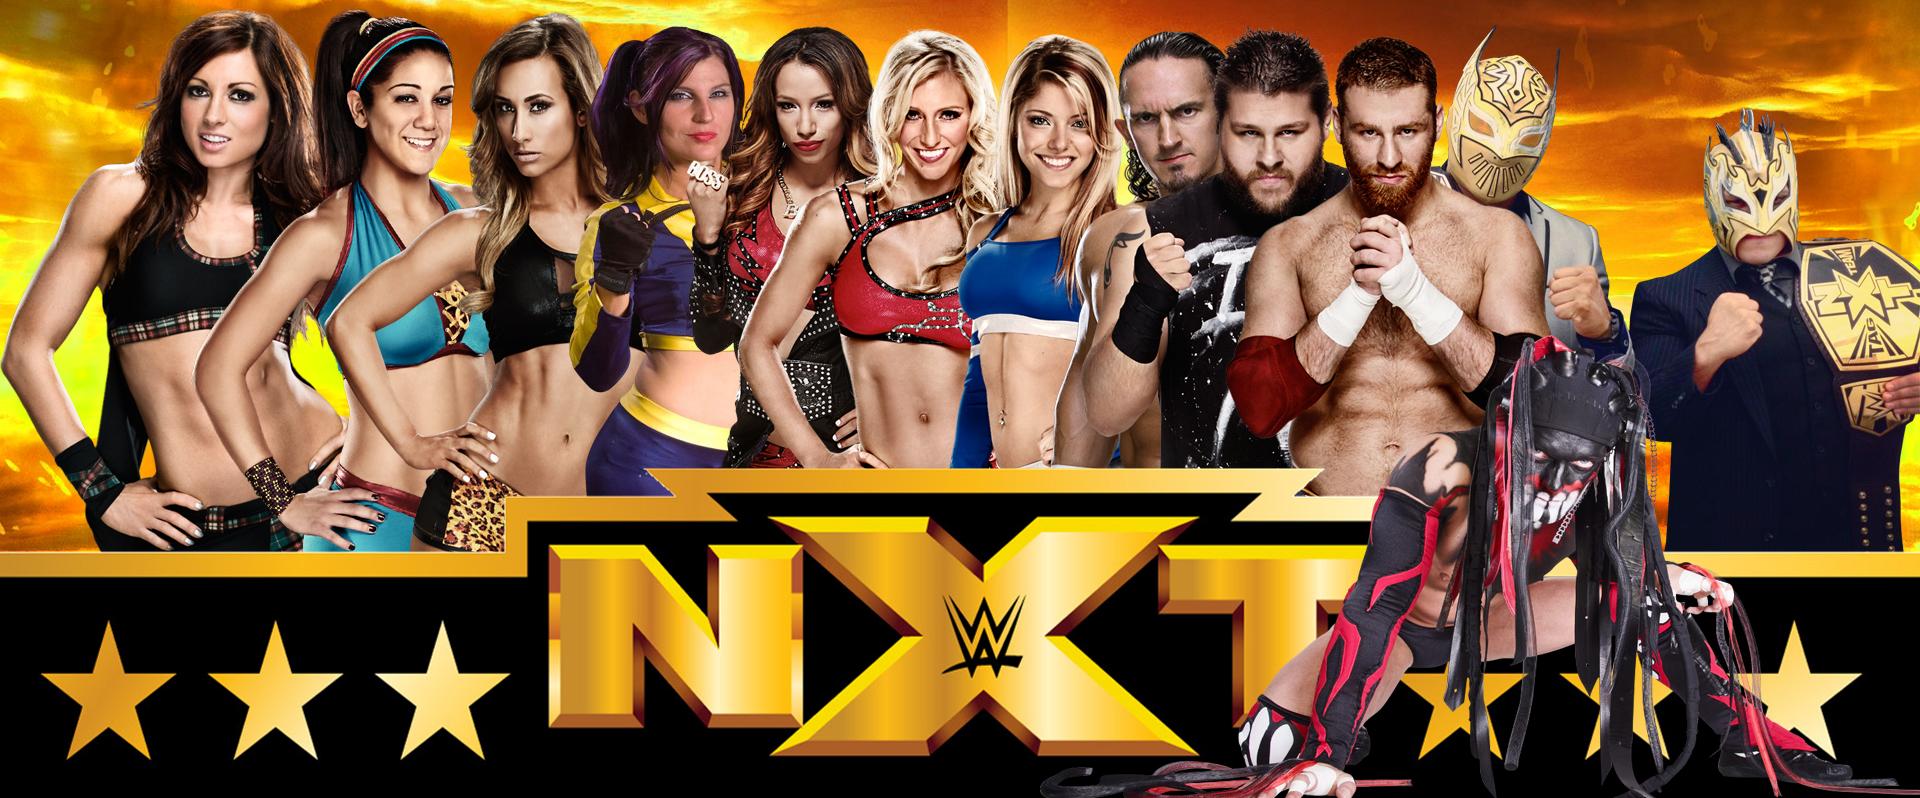 NXT By Barrymk100 On DeviantArt